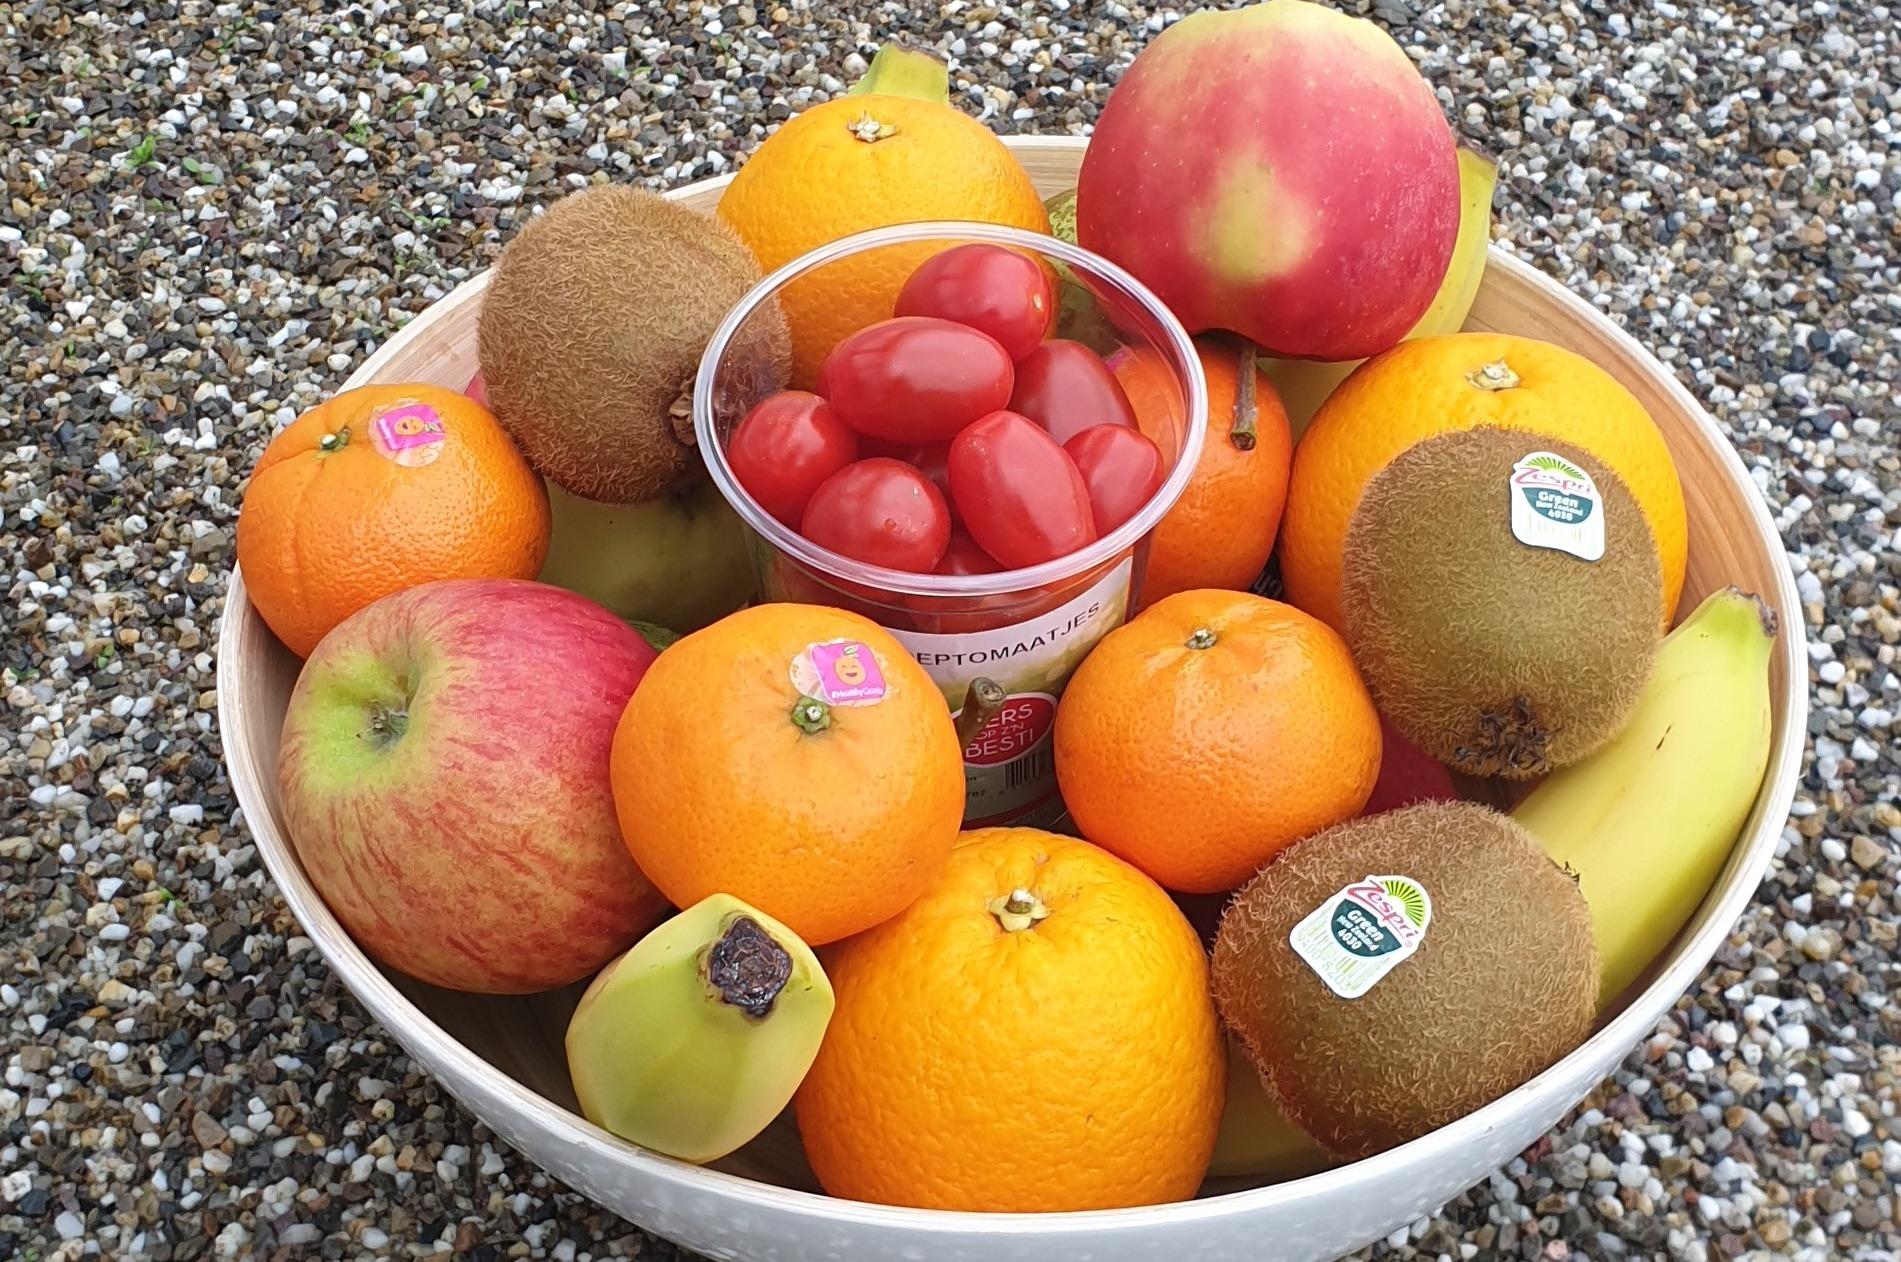 Werkfruit local 4 local basis 20 plus 1 seizoenfruit